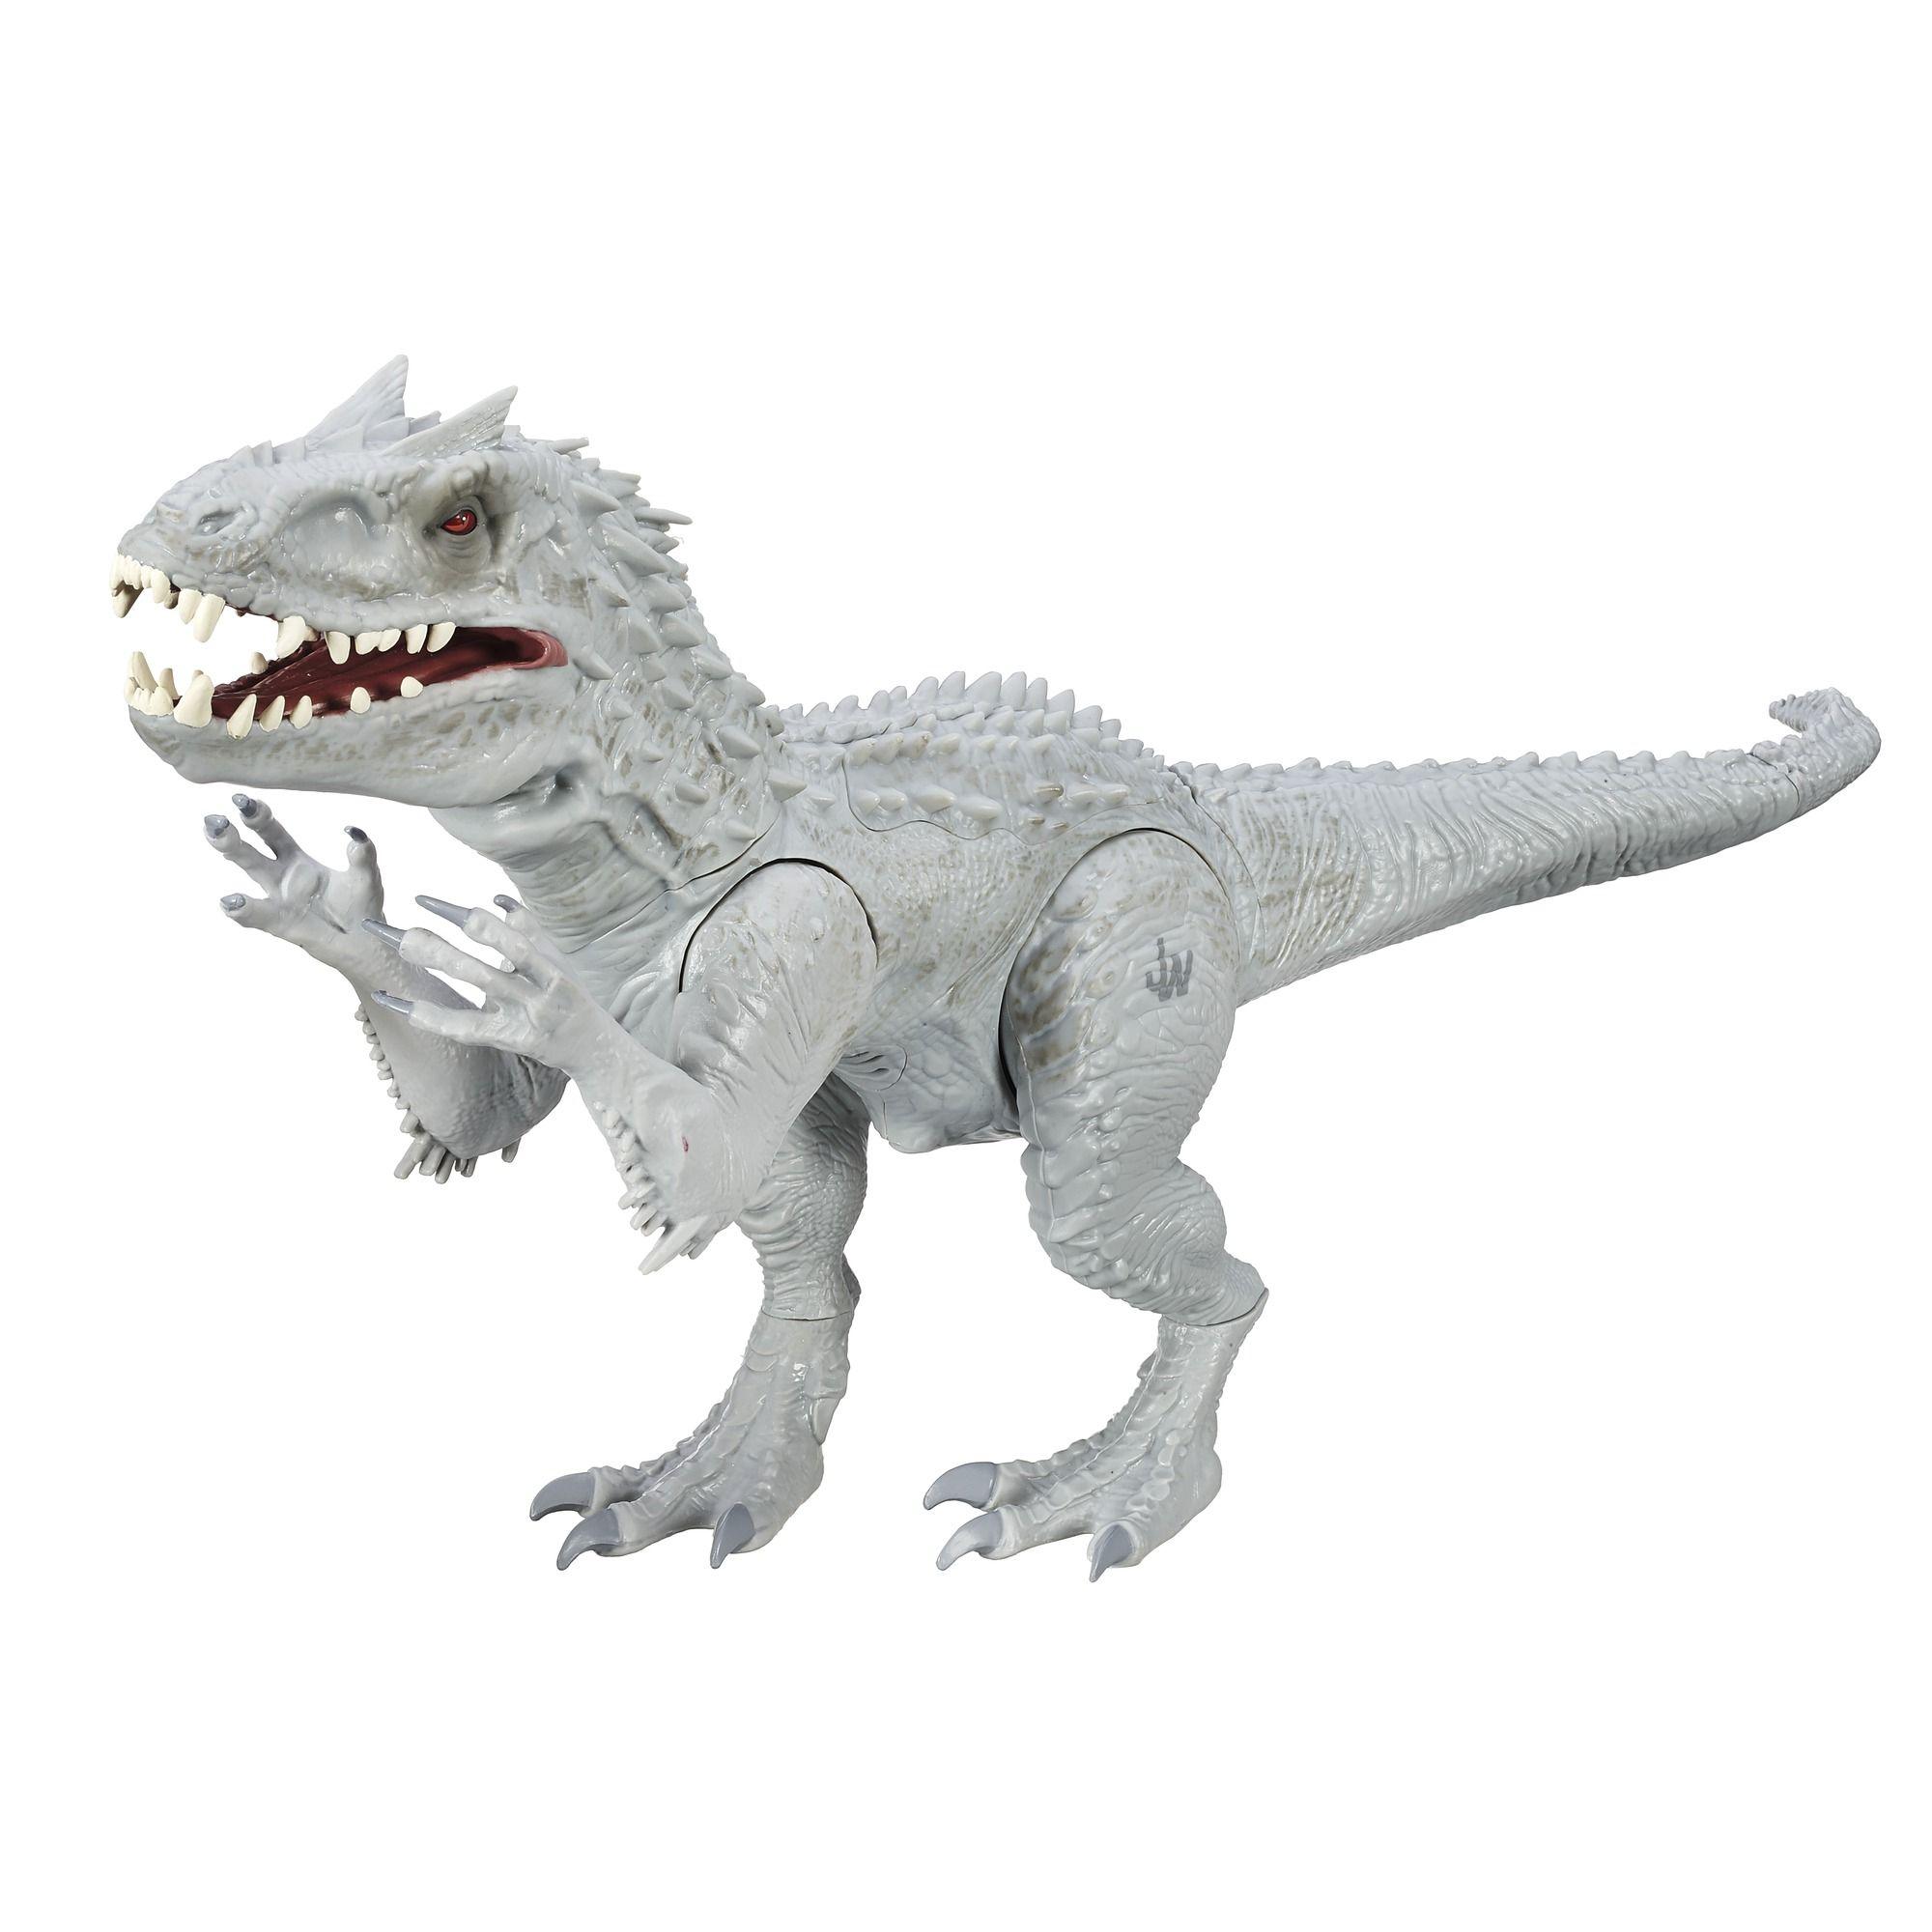 Jurassic World Indominus Rex Figure Dinosaur Figure Animal Model Kids Toy Gift